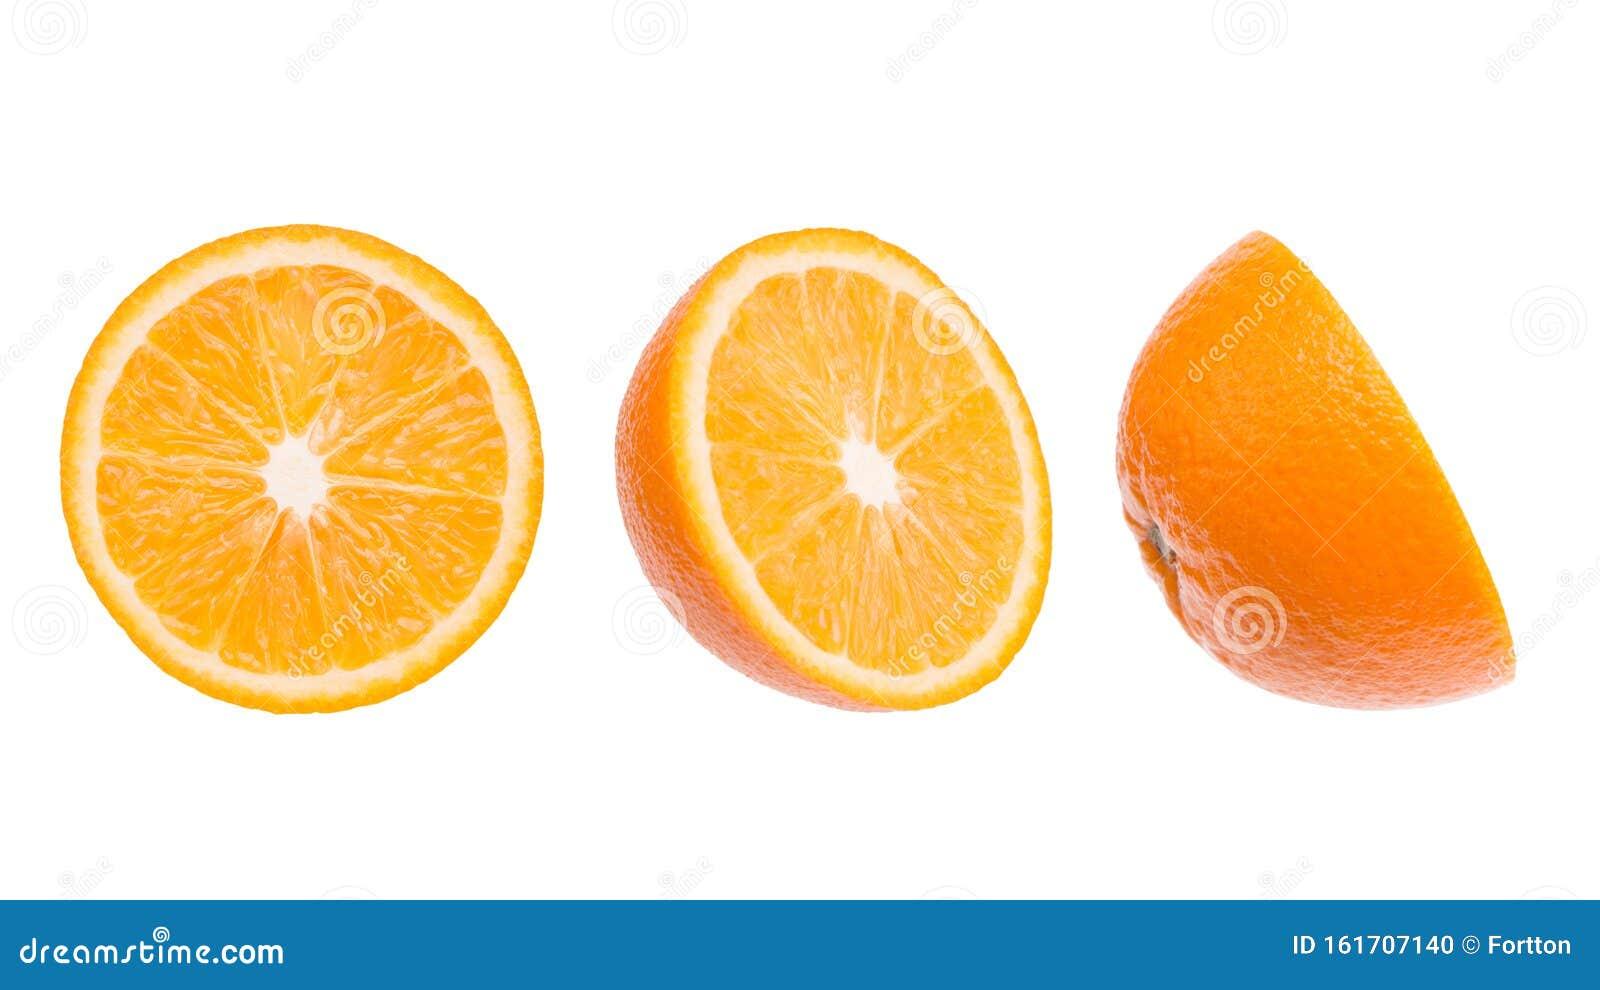 are oranges part of a no white diet